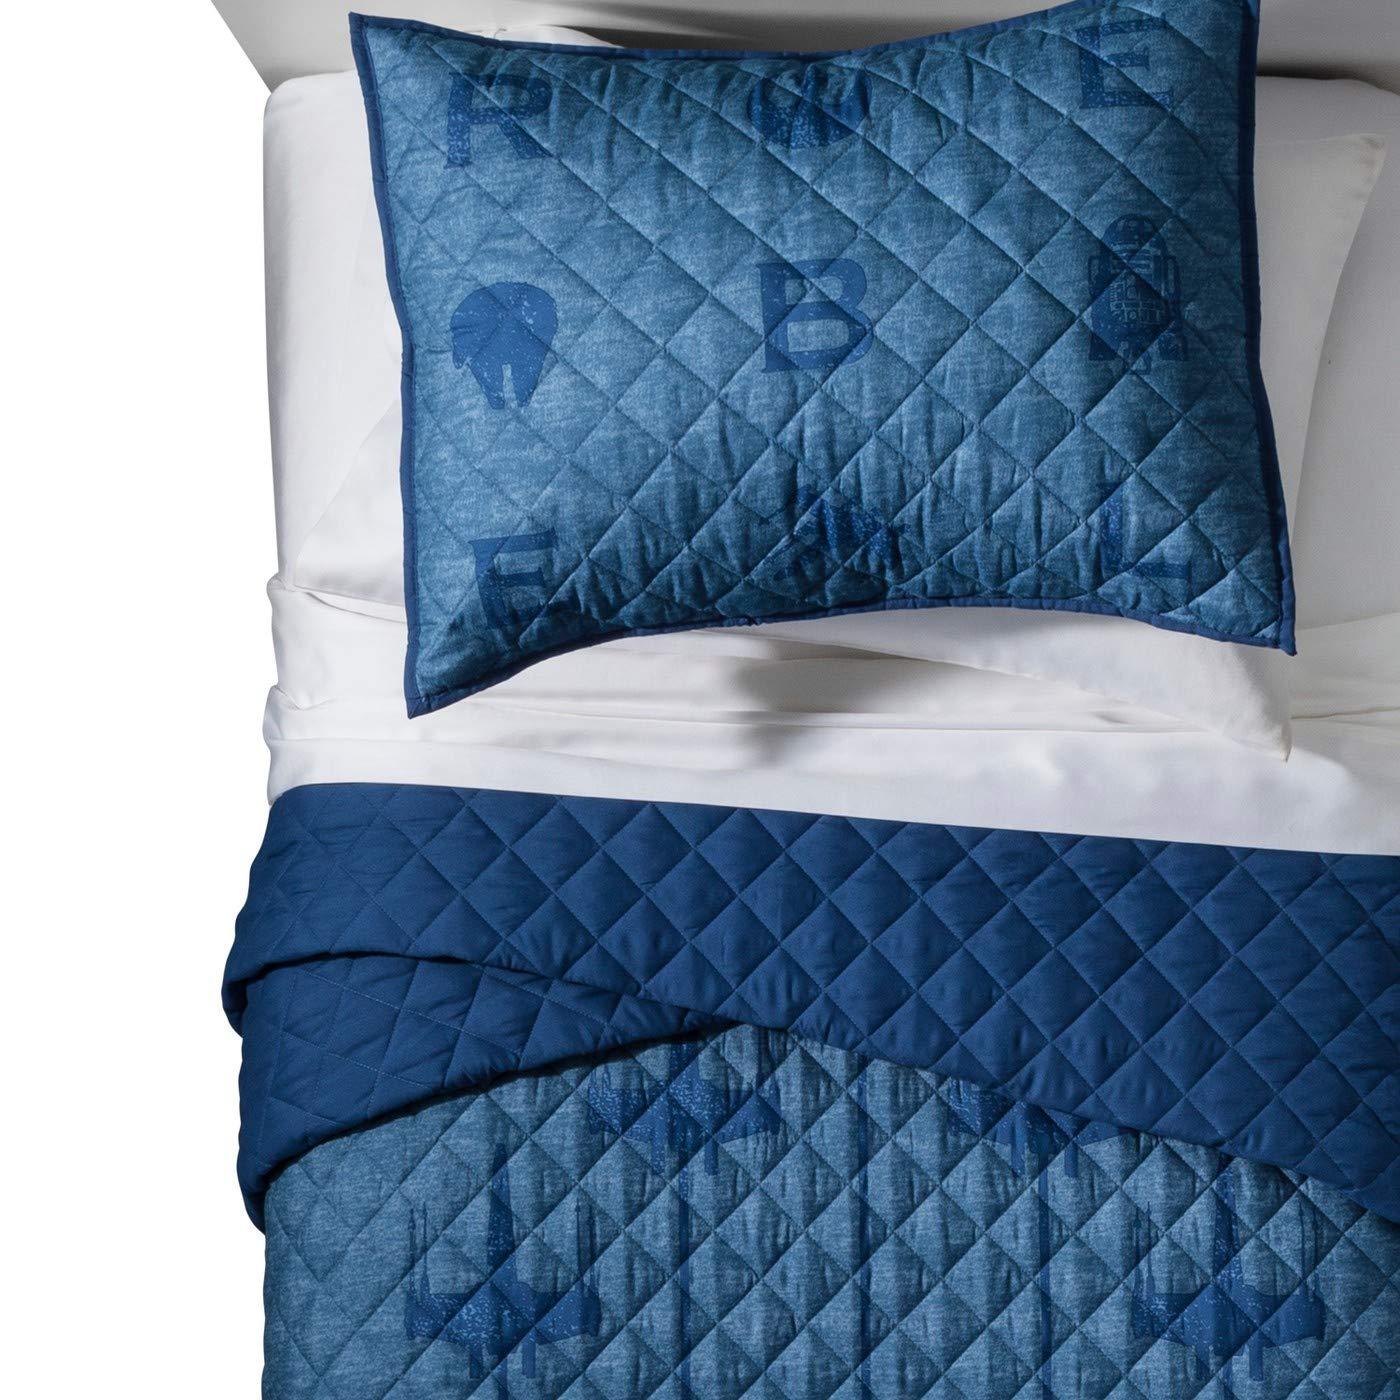 Star Wars Blue Quilt Set (Twin/Full) & Black Throw Pillow lucasfilm